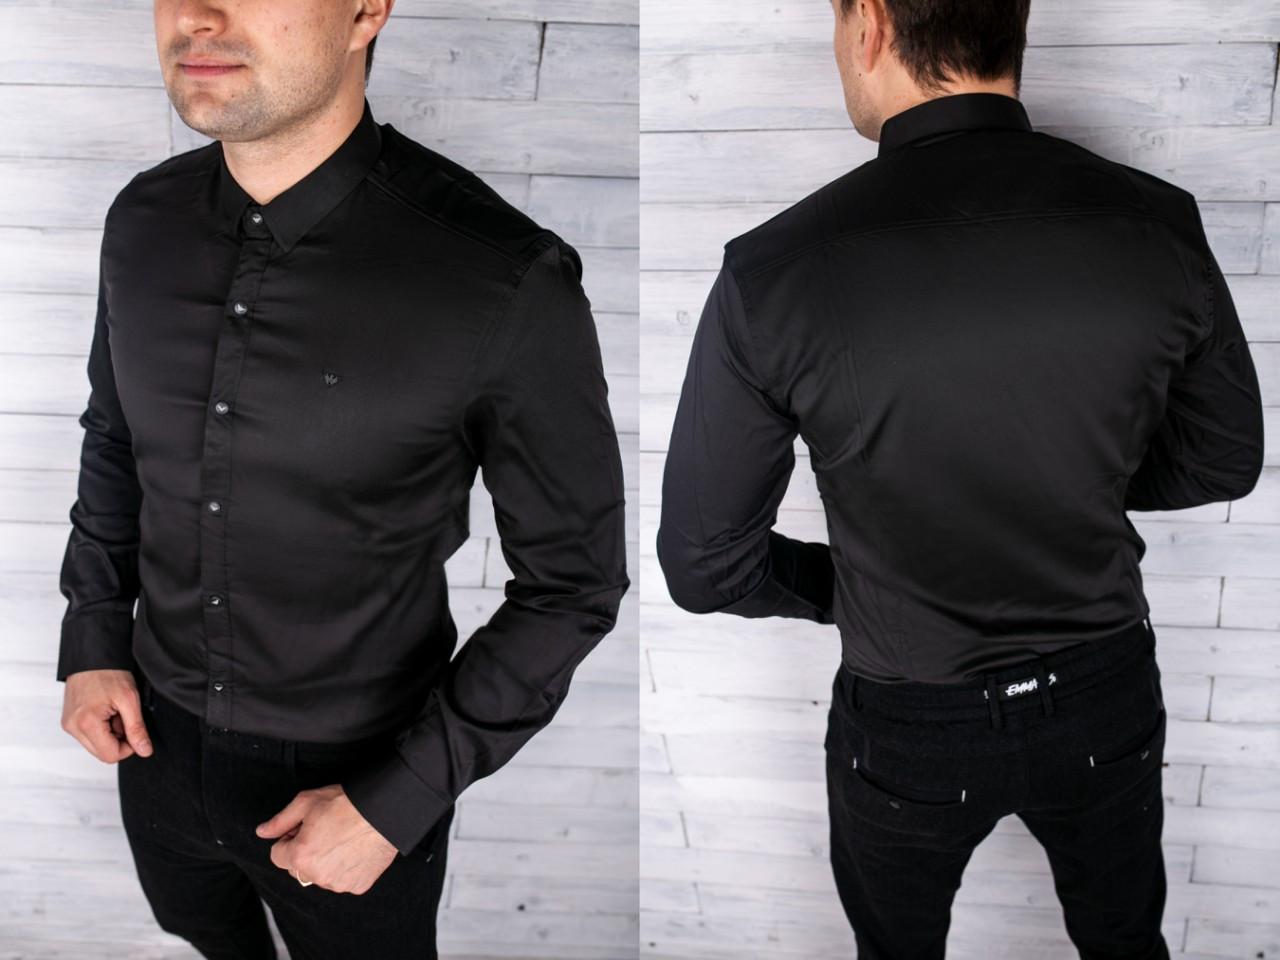 Мужская рубашка Armani Материал: 95% cotton, 5% lycra  ️Размеры: L,XL,2XL,3XL,4XL